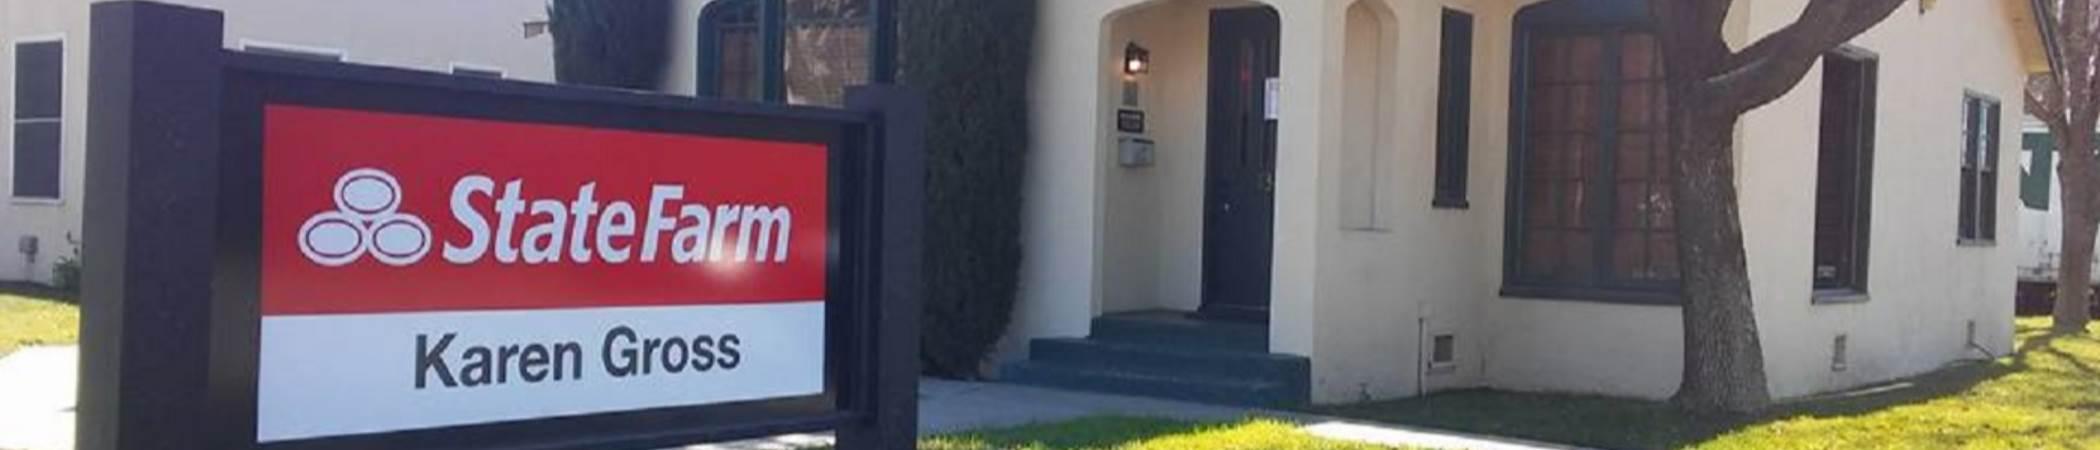 Karen Gross State Farm Insurance in Visalia, CA | Home, Auto Insurance & more